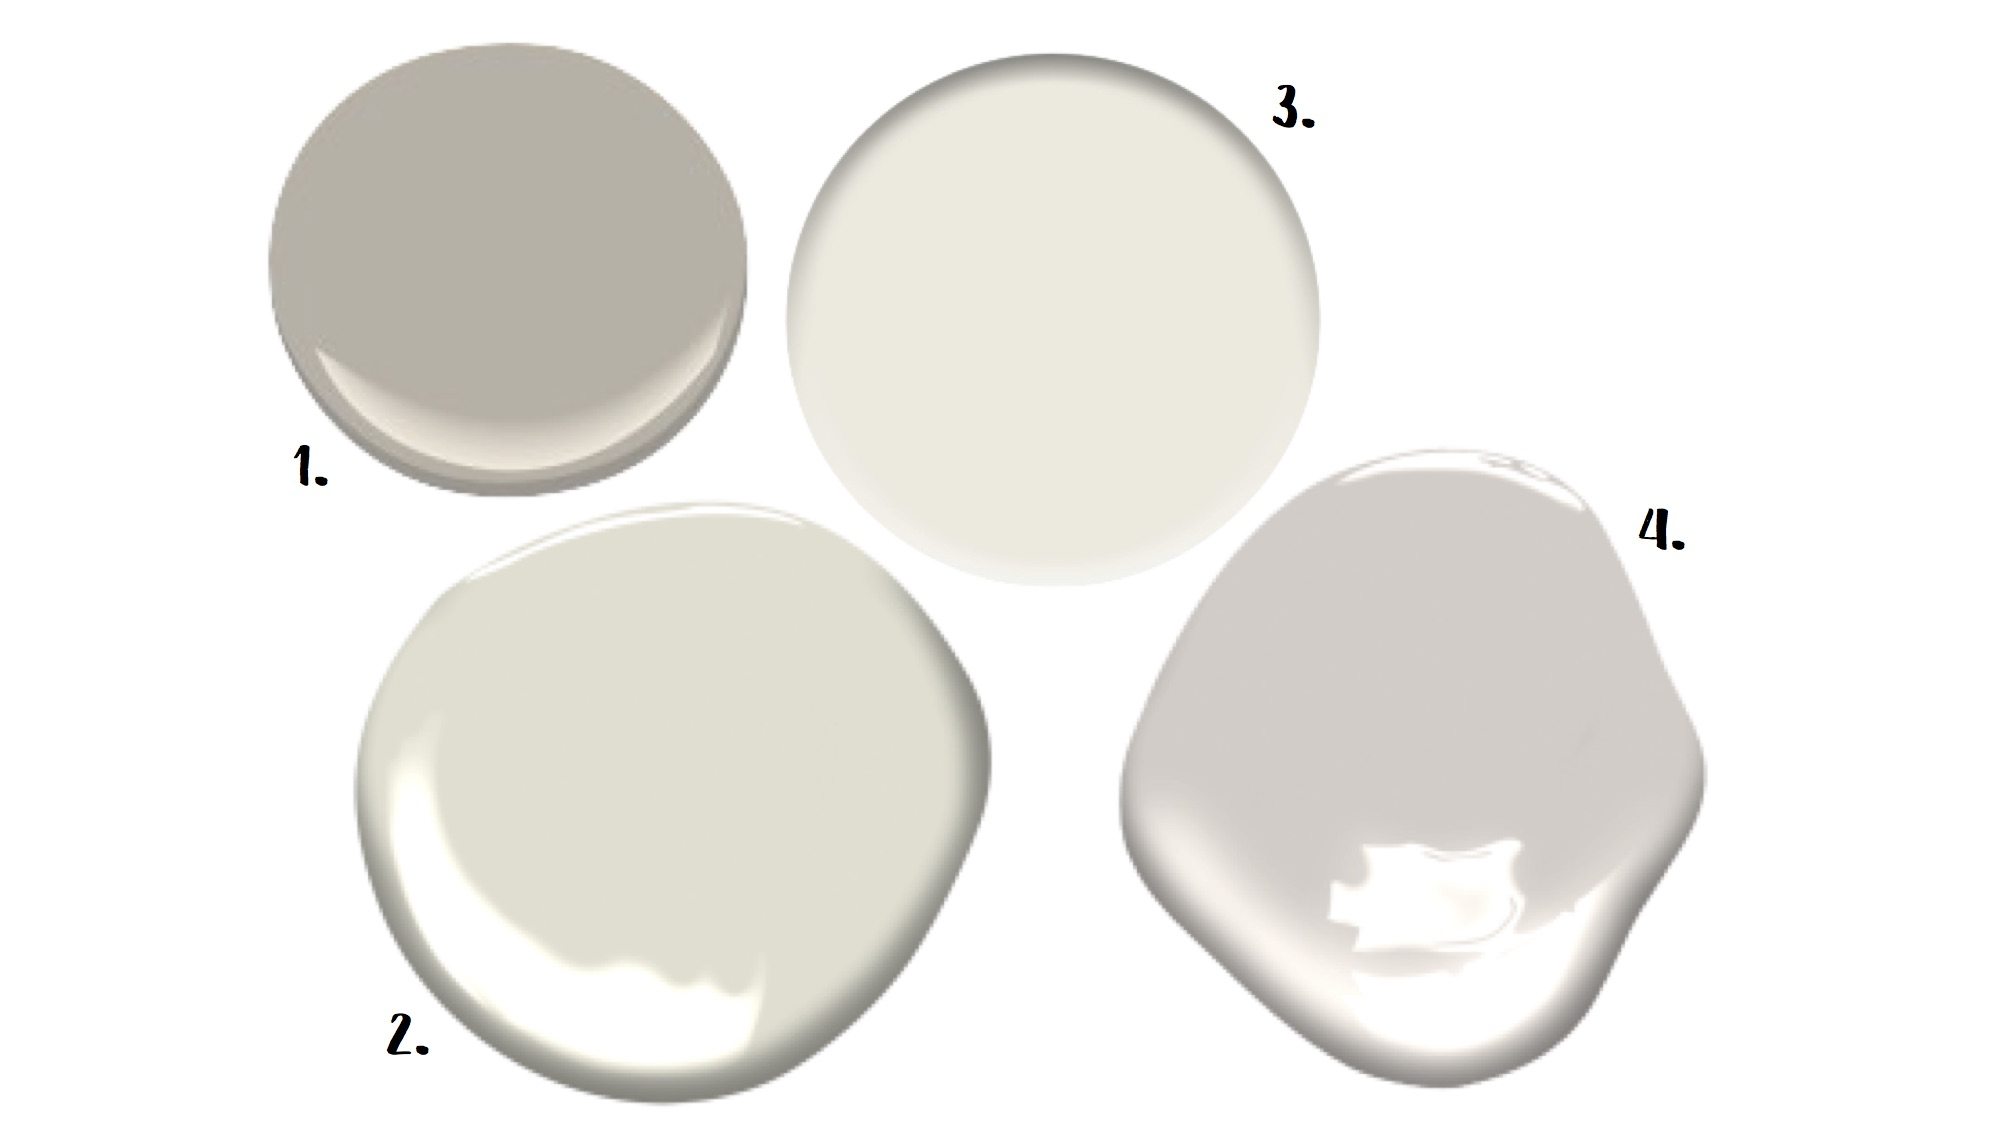 1. Silver Fox (Benjamin Moore) 2. Halo (Benjamin Moore) 3. Alabaster (Sherwin Williams) 4. Portland Gray (Benjamin Gray)